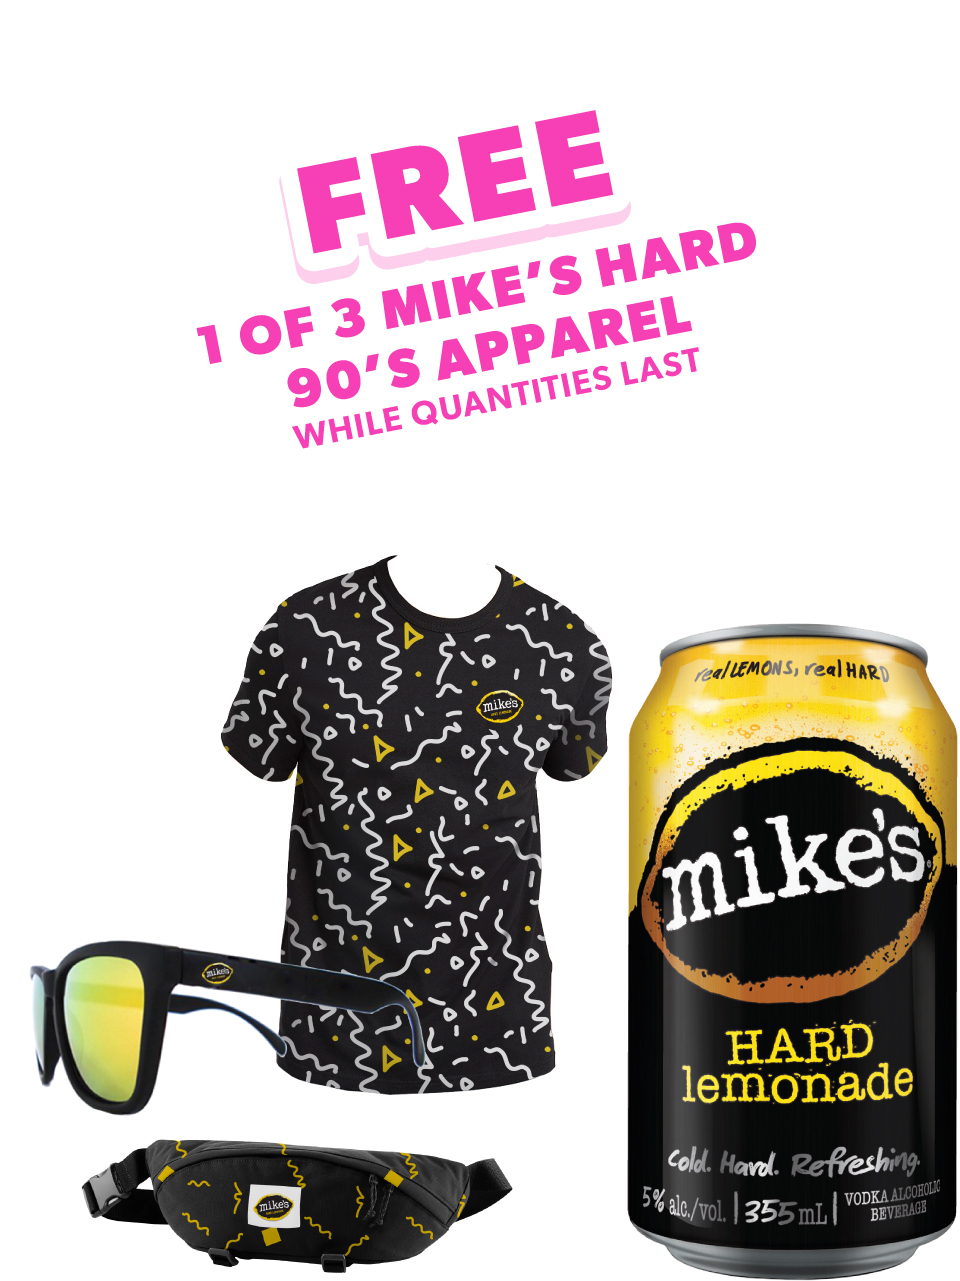 Mike's Hard Lemonade 6 Pack Cans